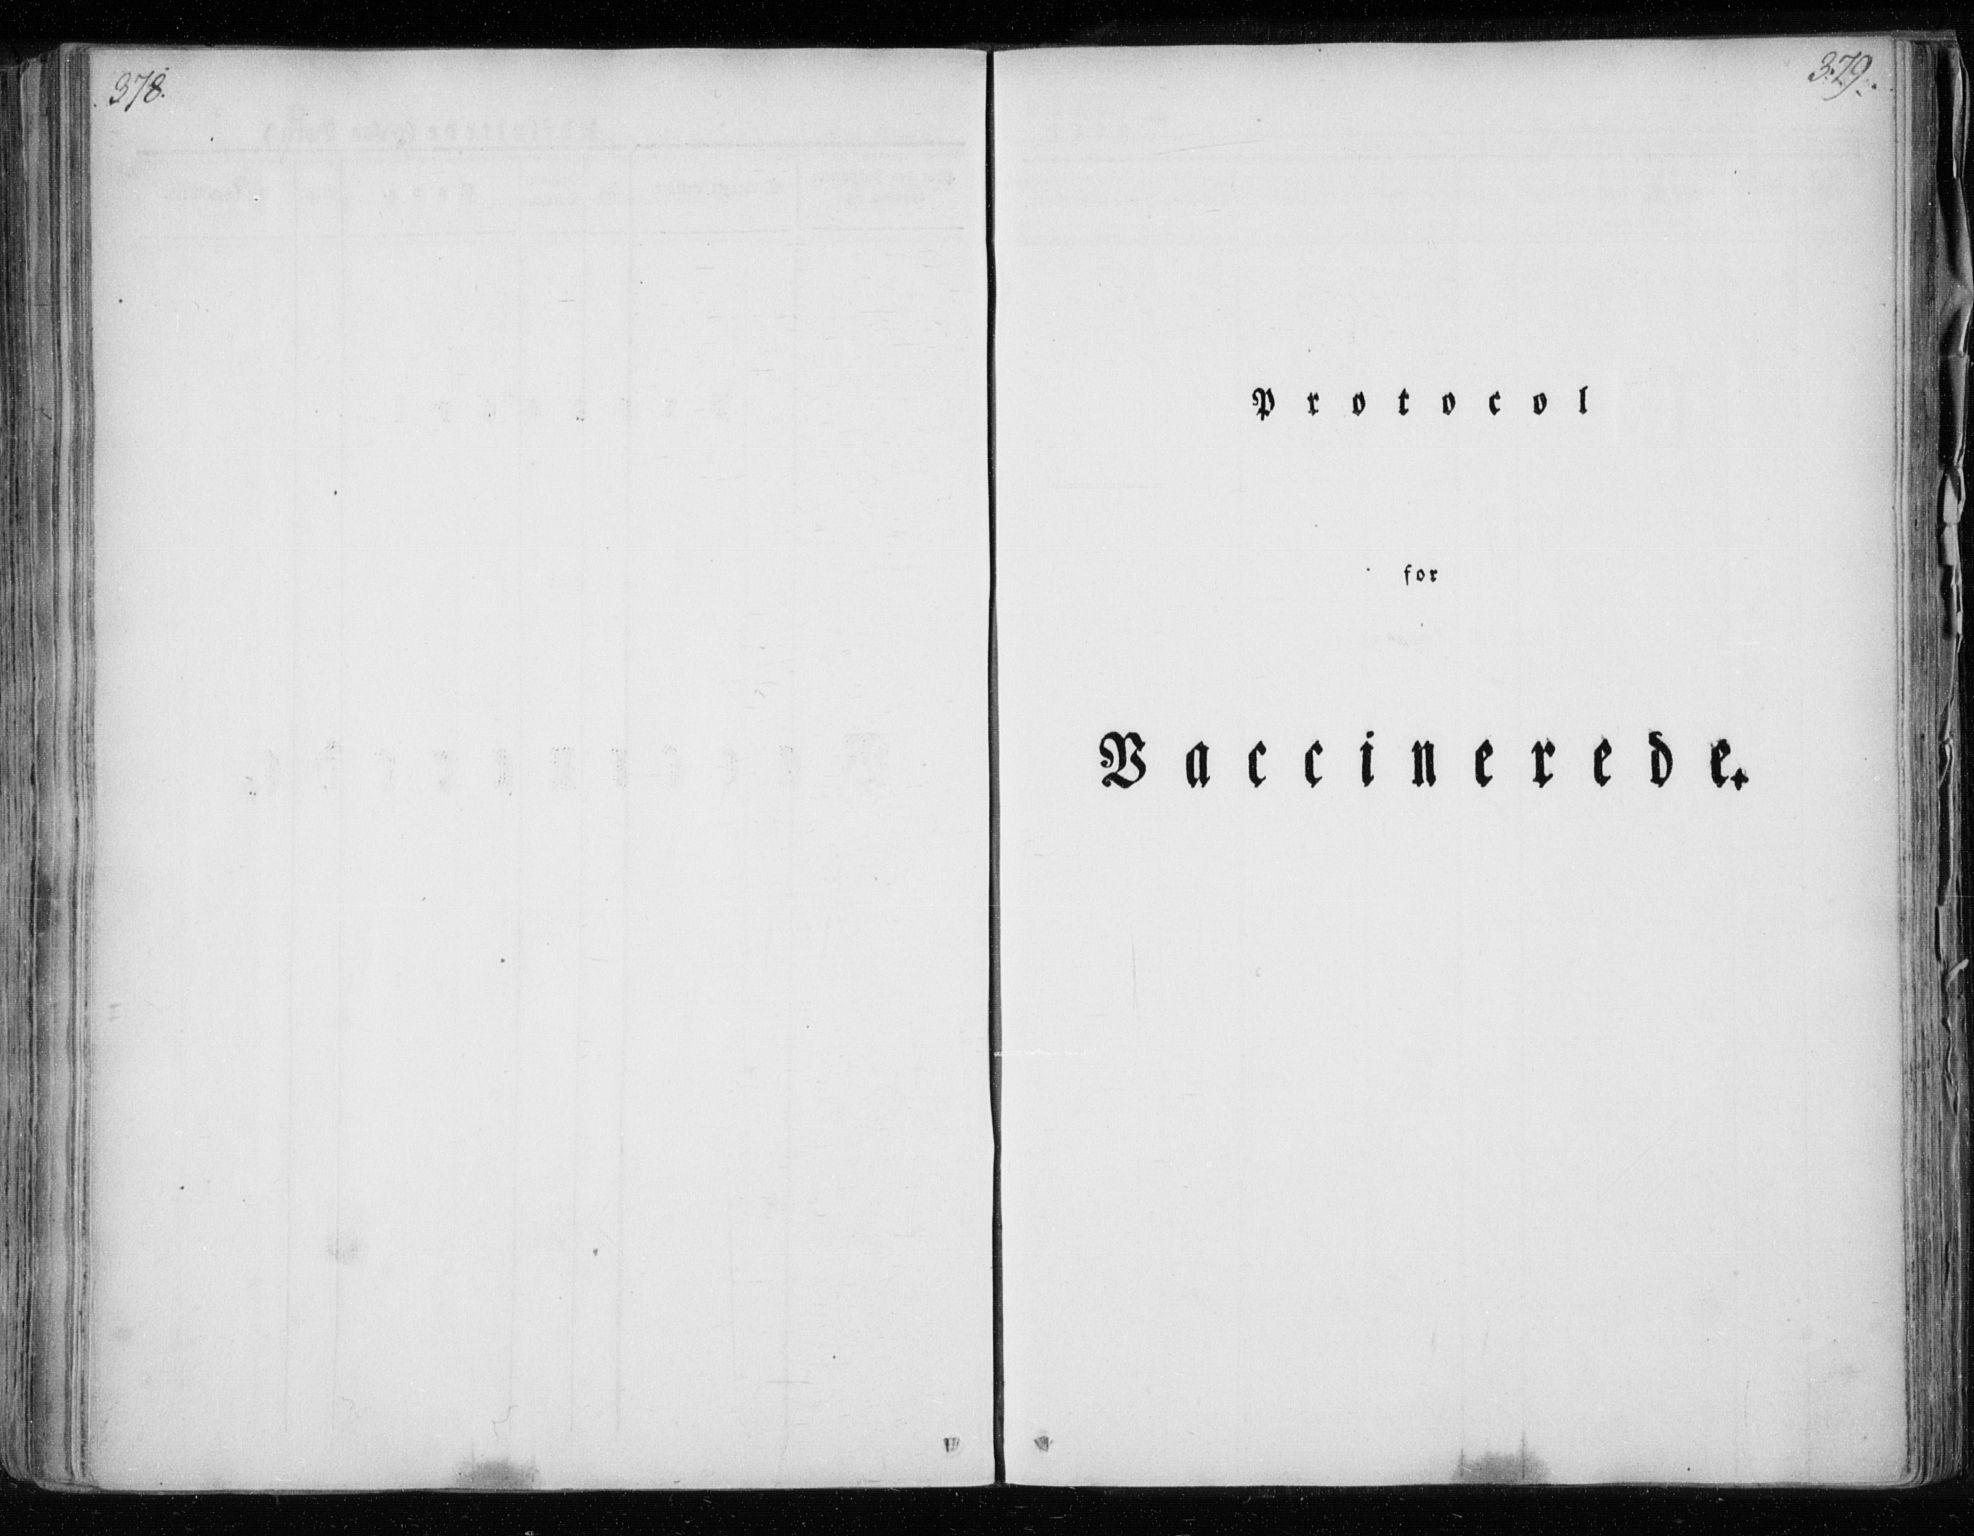 SAT, Ministerialprotokoller, klokkerbøker og fødselsregistre - Nordland, 825/L0354: Ministerialbok nr. 825A08, 1826-1841, s. 378-379